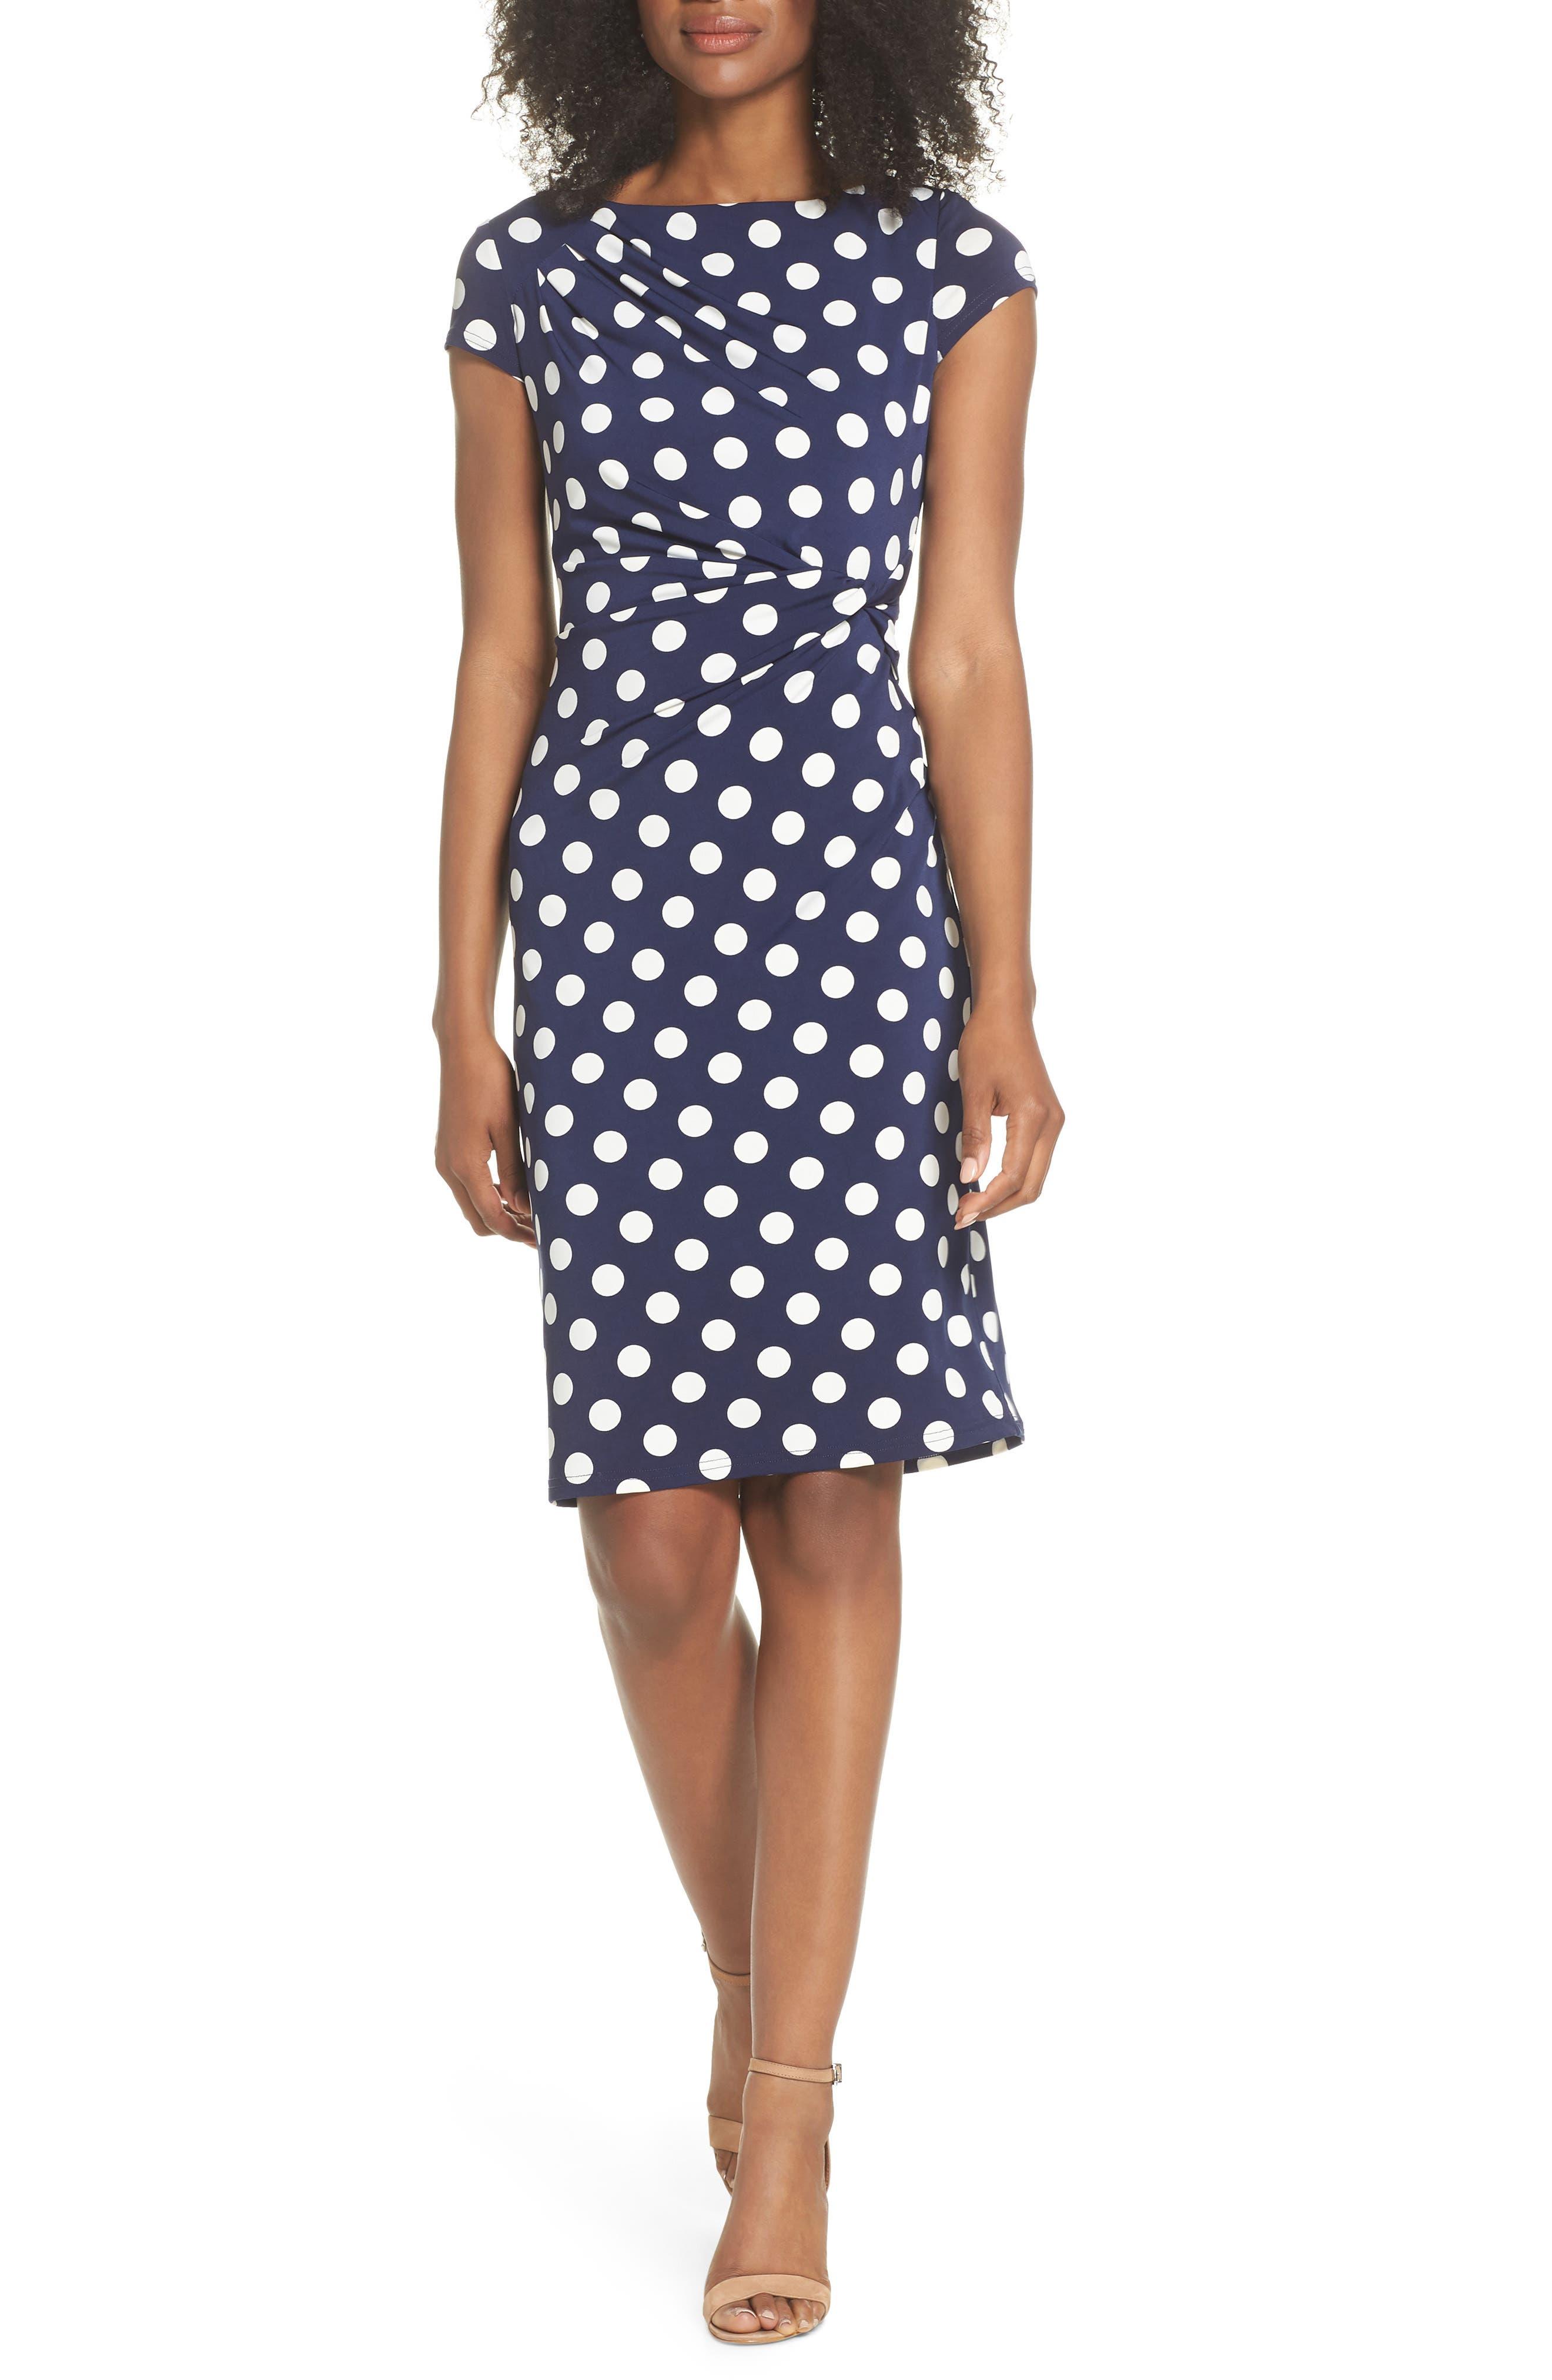 ELIZA J, Polka Dot Side Twist Sheath Dress, Main thumbnail 1, color, NAVY/ IVORY